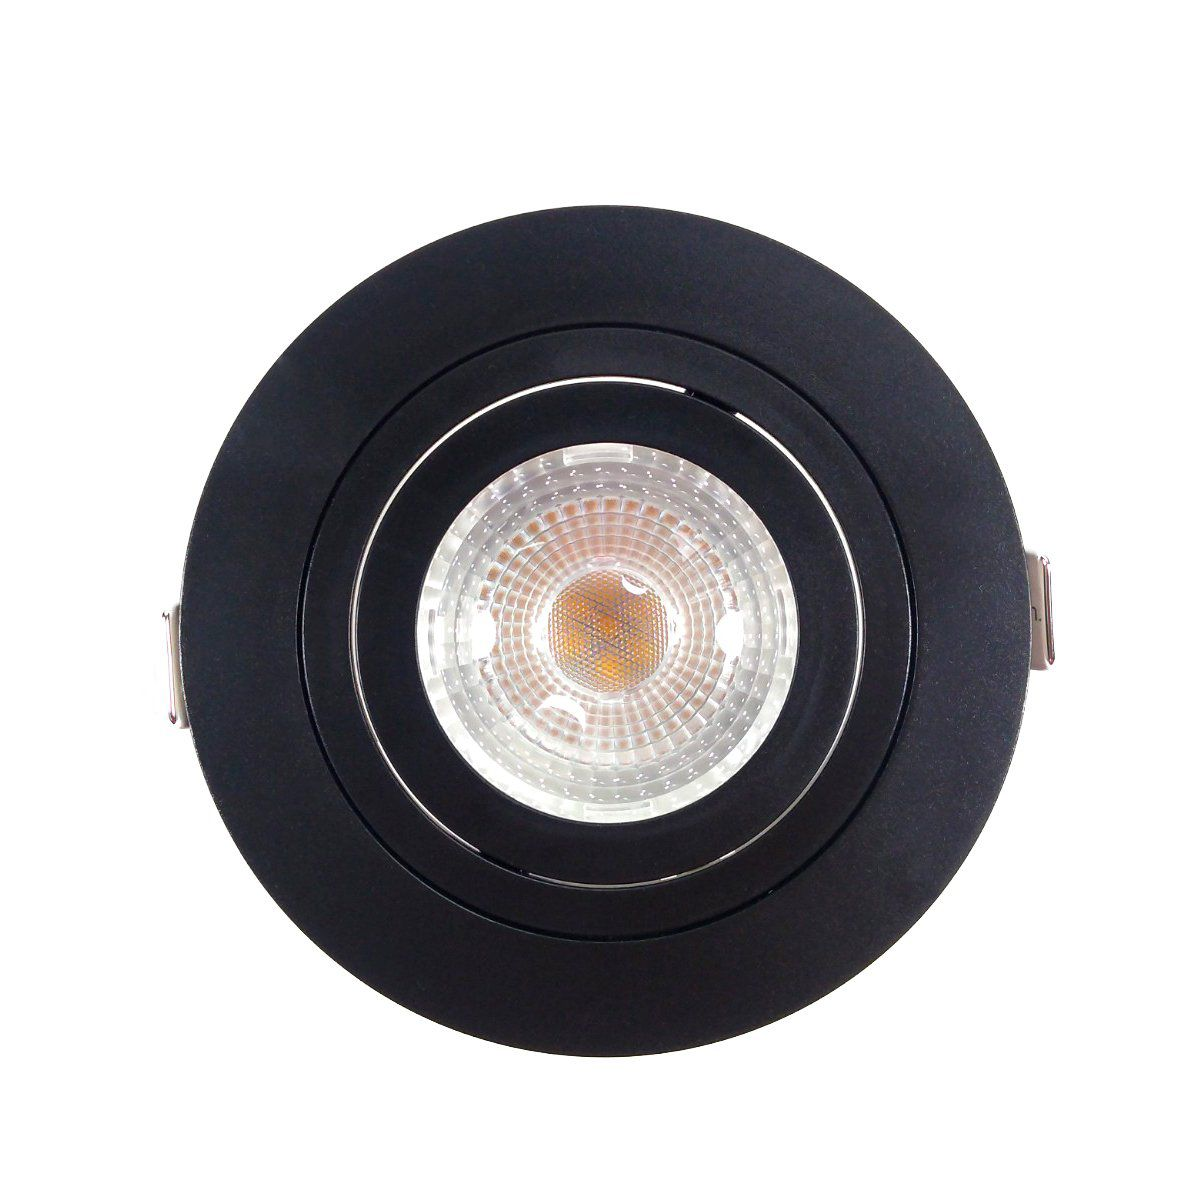 Kit 20x Spot Par 20 recuado + 10x Spot Redondo + 30 Lâmpadas LED Branco Frio